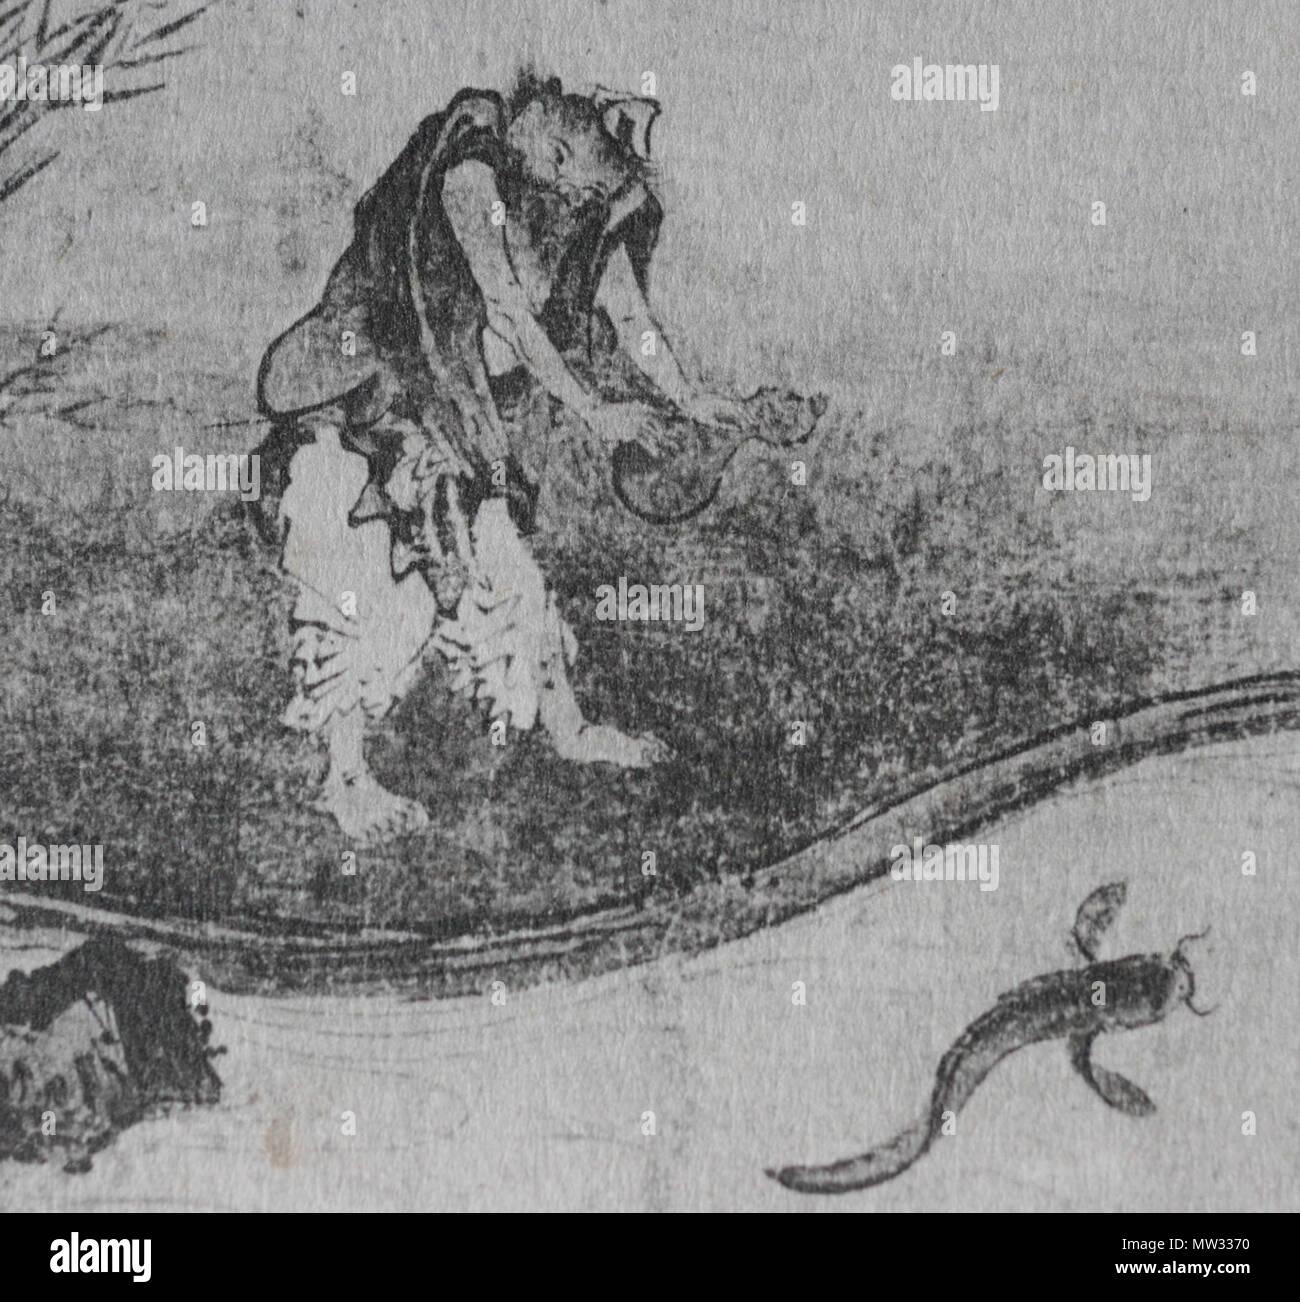 . English: Detail of Hyonen zu by Josetsu, painter from the Muromachi period, ca 1415, ink on paper, Toal size:111.5cm height, 75.8cm wide, Taizo-in, Myoshin-ji, Kyoto, Japan 瓢鯰図 部分、如拙、紙本水墨 111.5cm x75.8cm 京都 妙心寺、室町時代1415年ごろ . about ACE1415. Jyosetsu 289 Hyonen zu by Josetsu2 - Stock Image